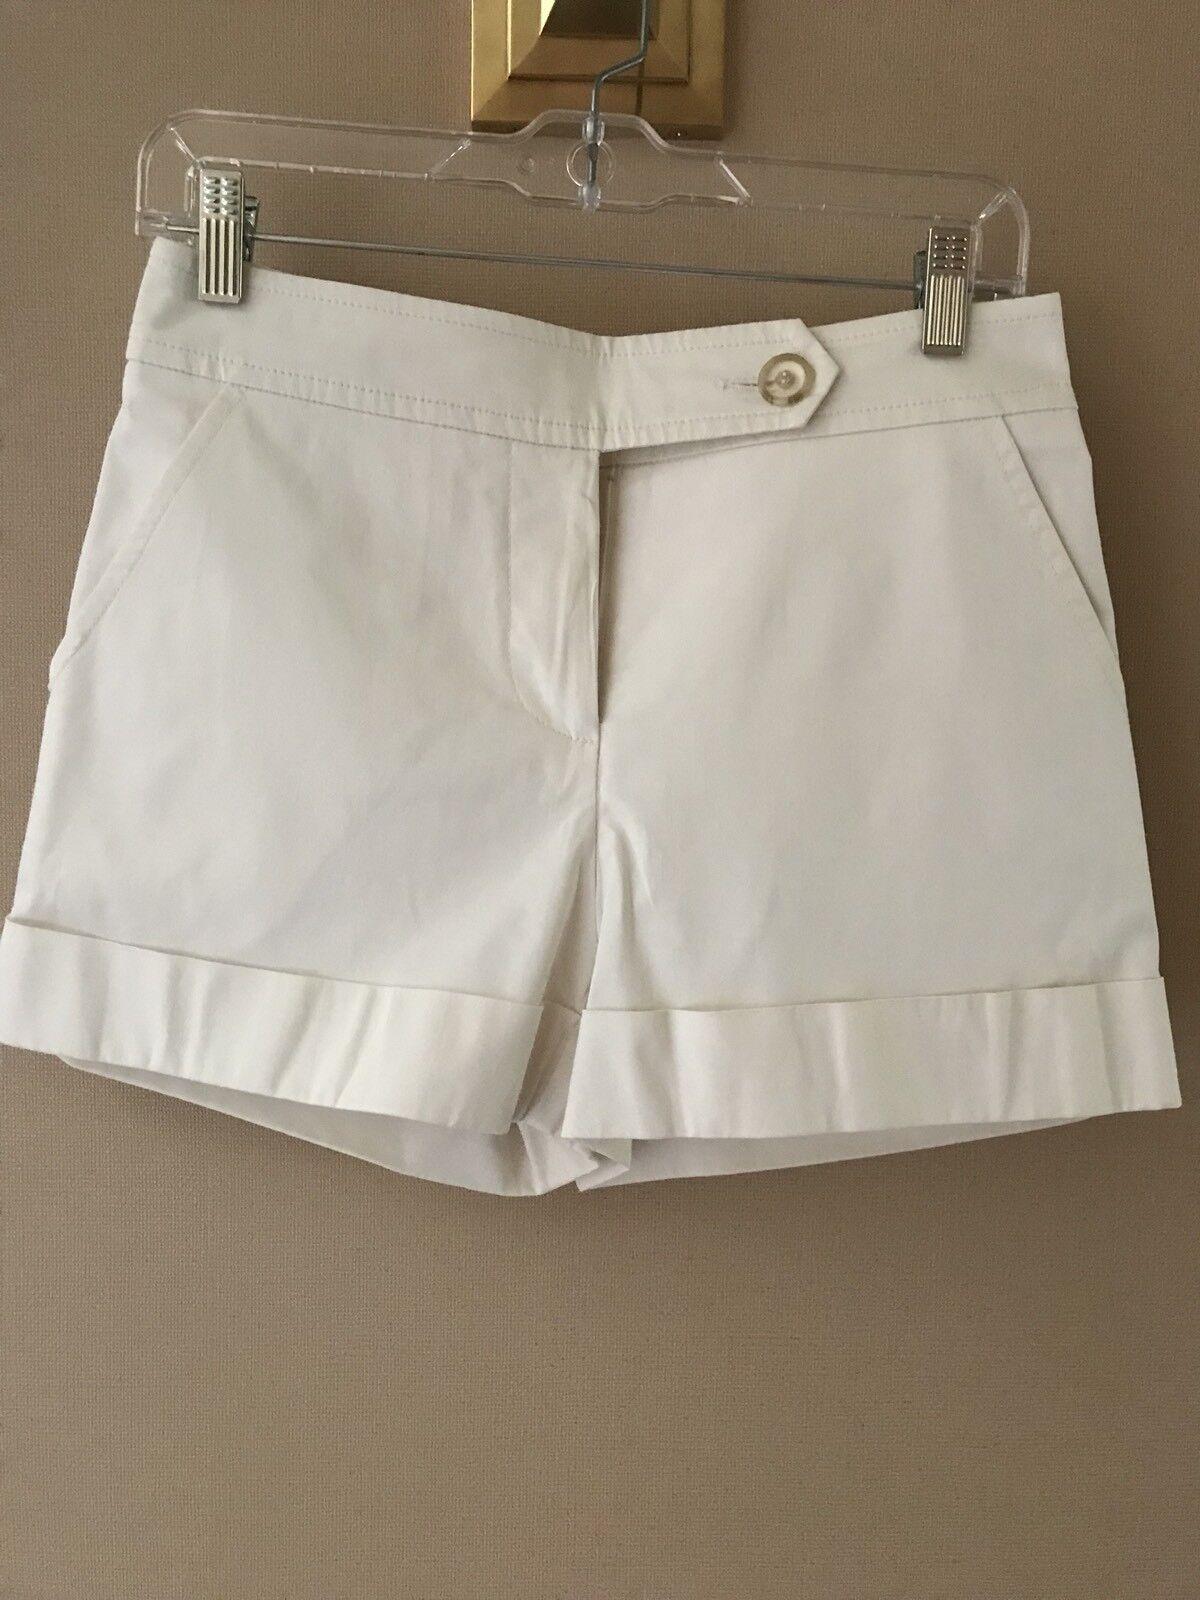 TRINA TURK Cuffed White Shorts 2